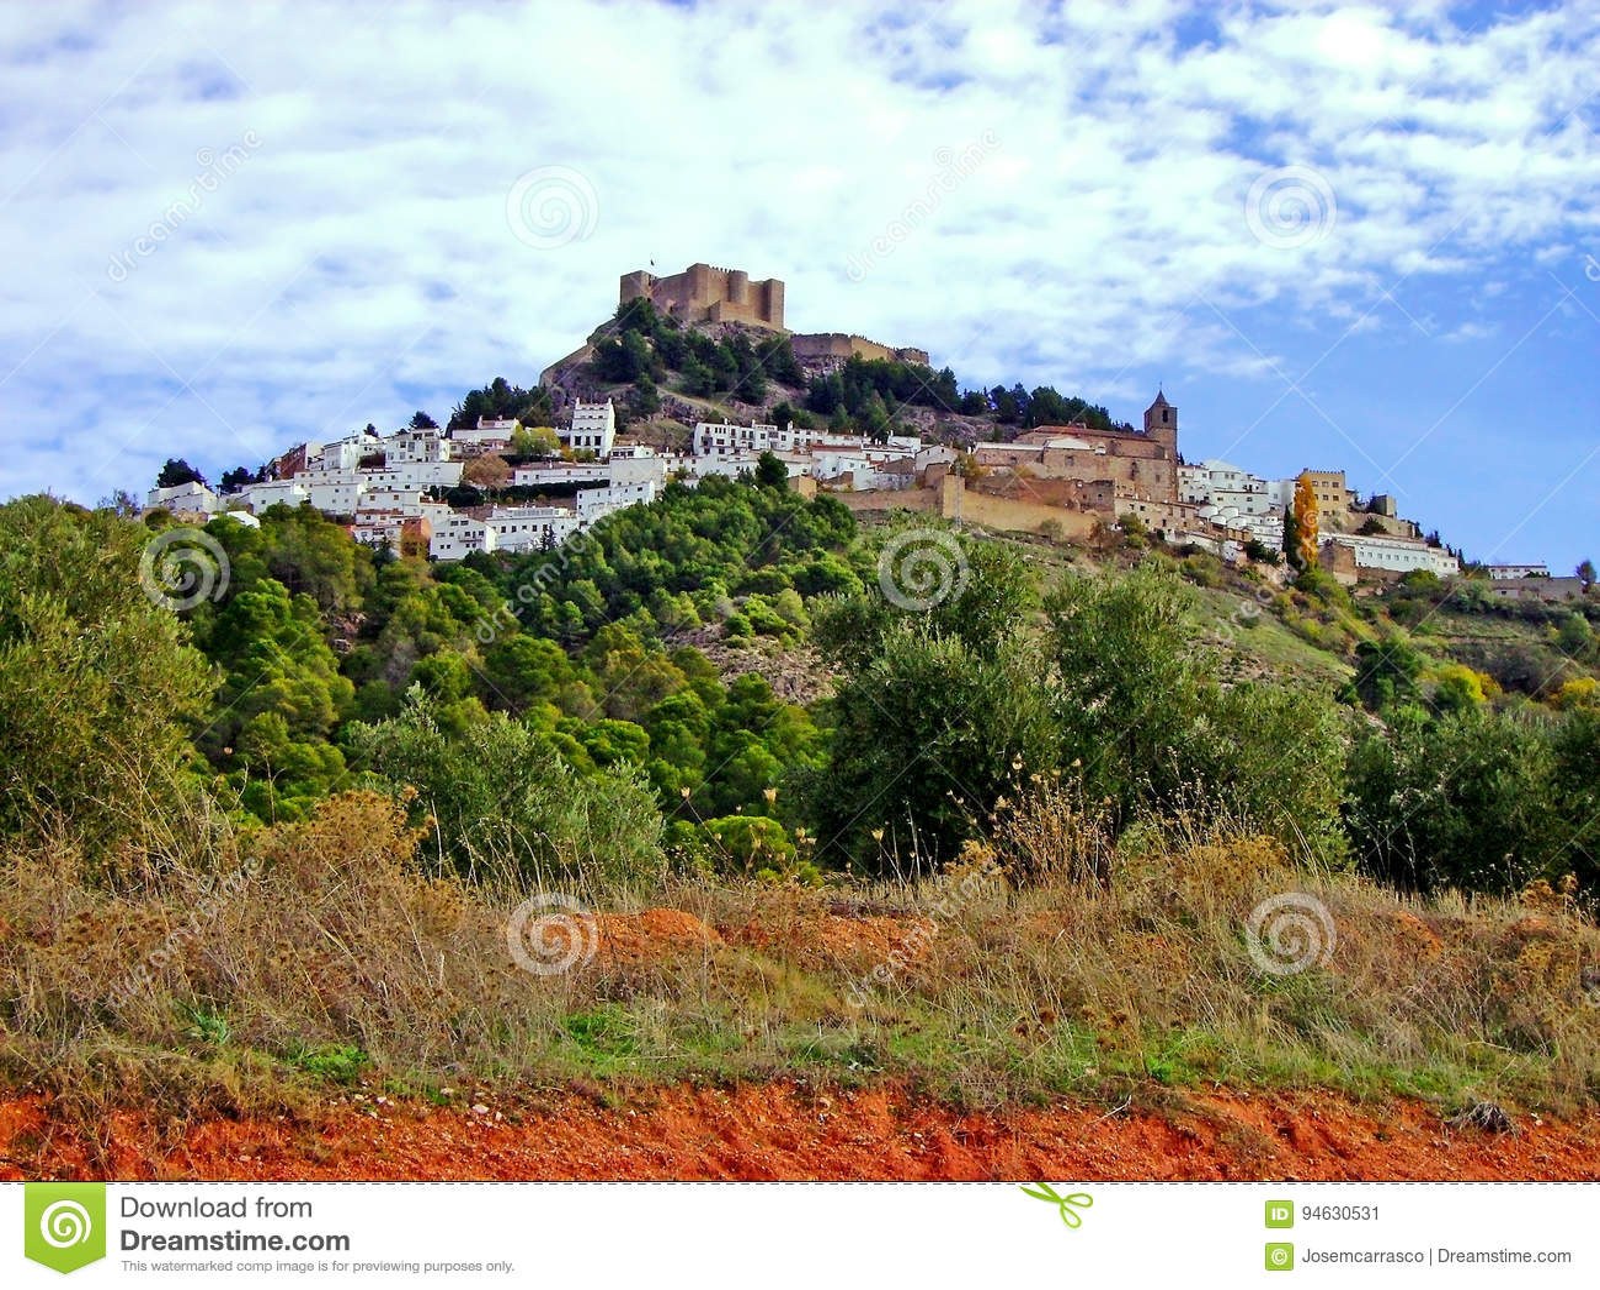 Village Segura de la Sierra, Jaen. Andalusia. Spain